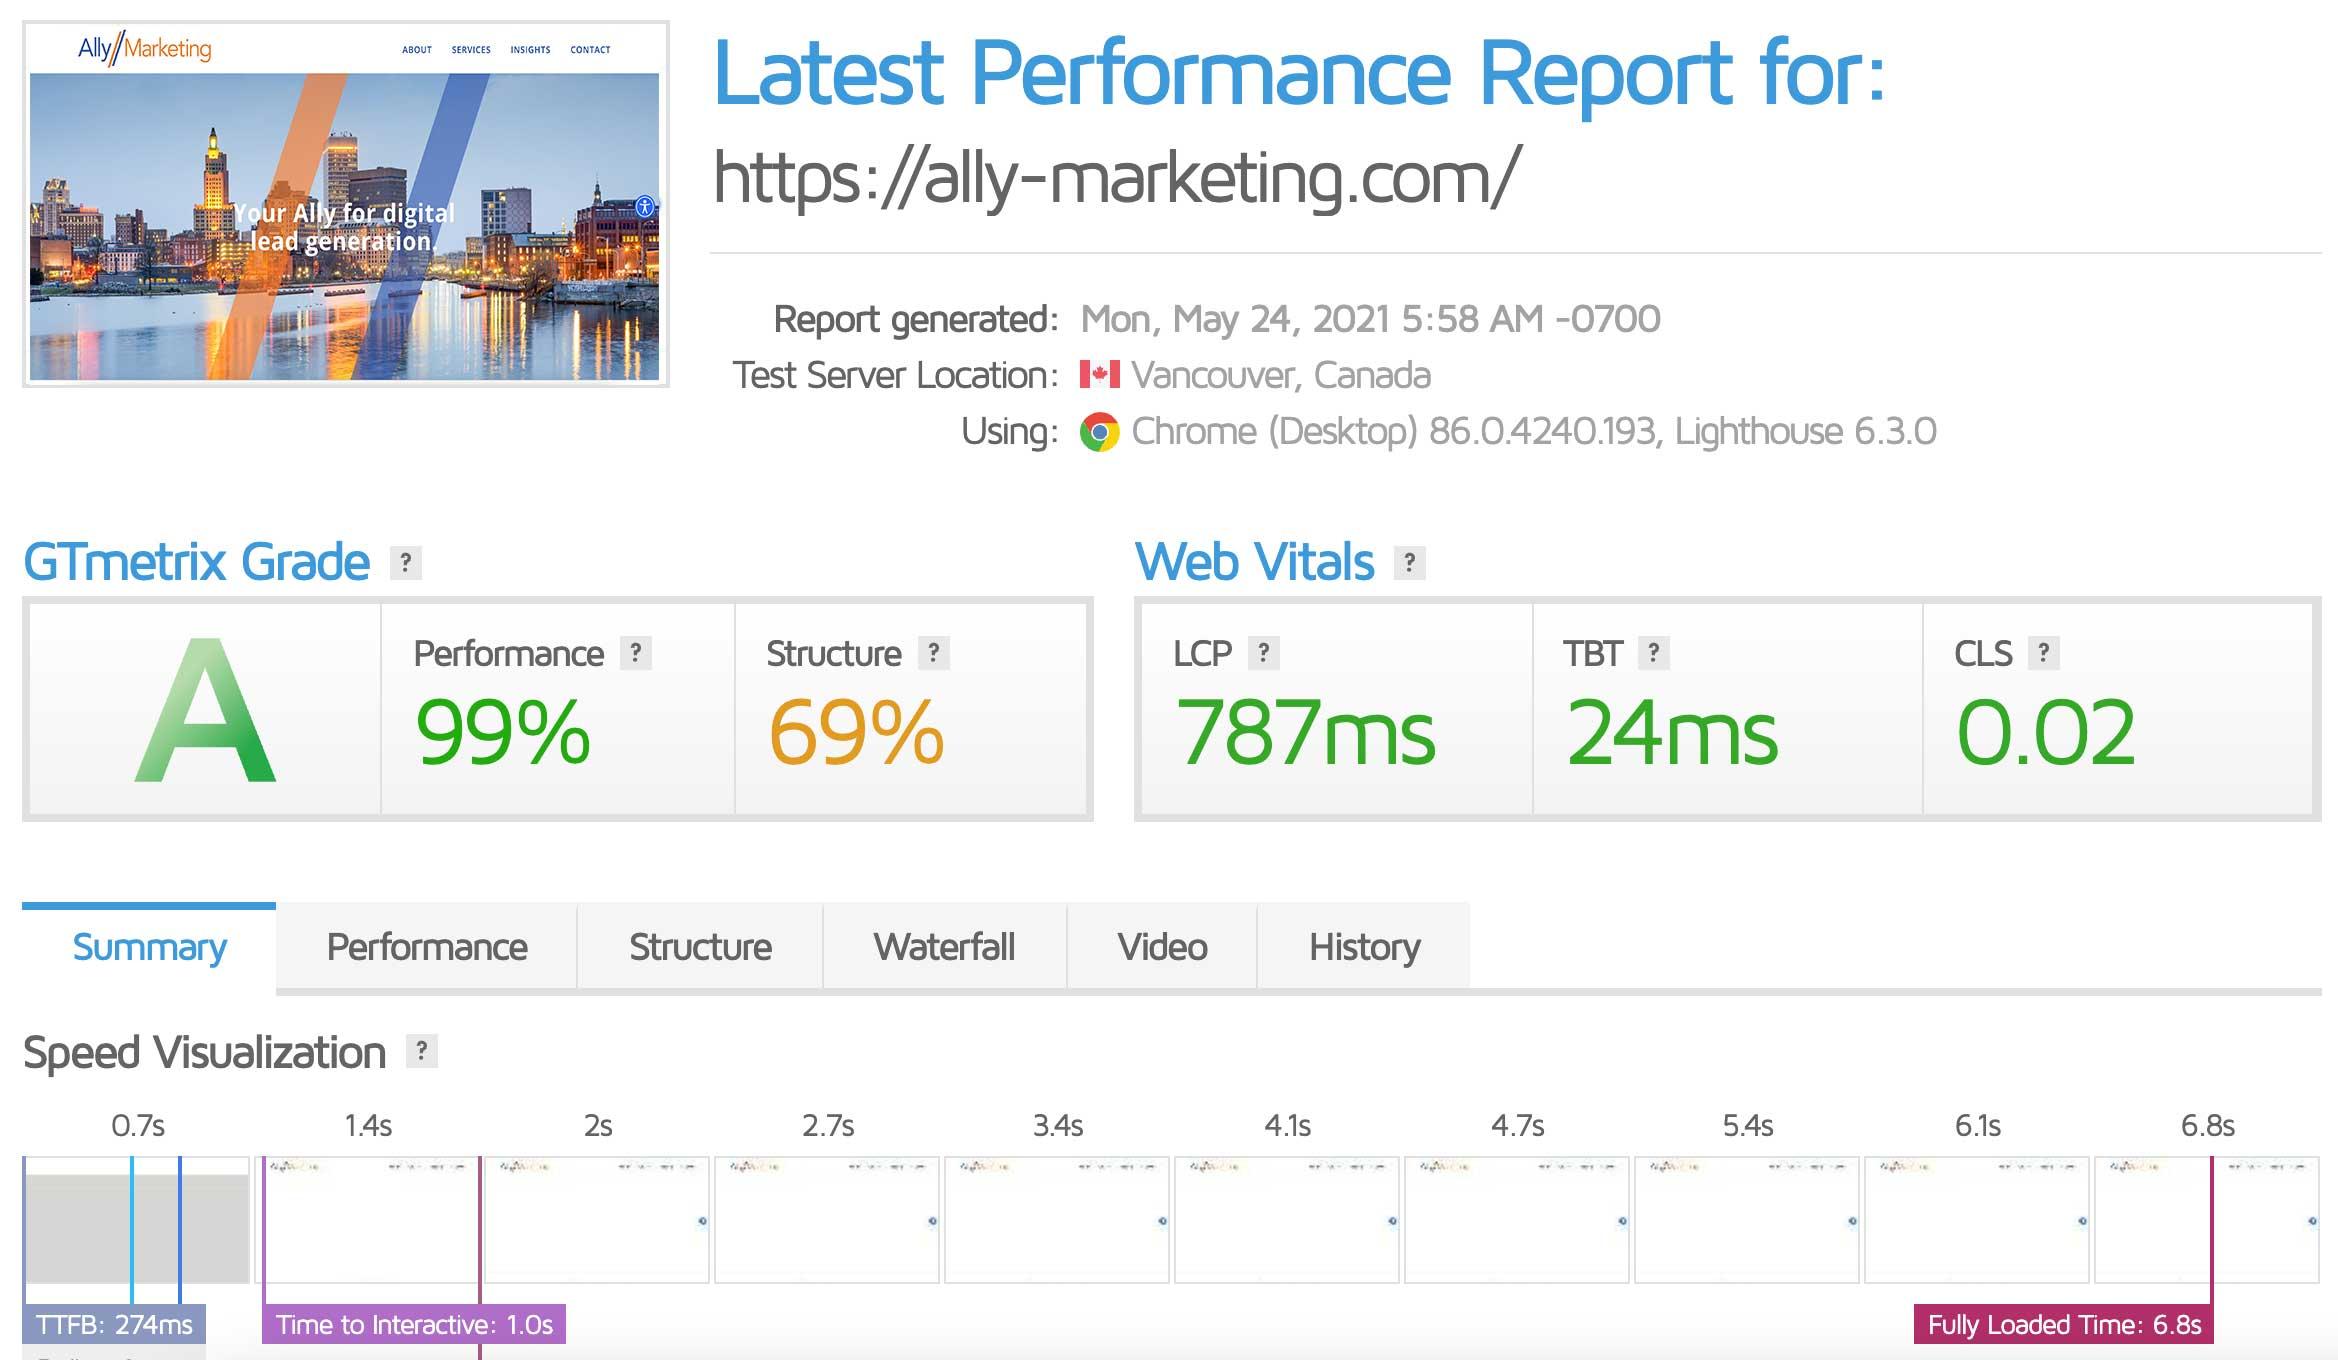 GTMetrix Screenshot of Ally Marketing Report